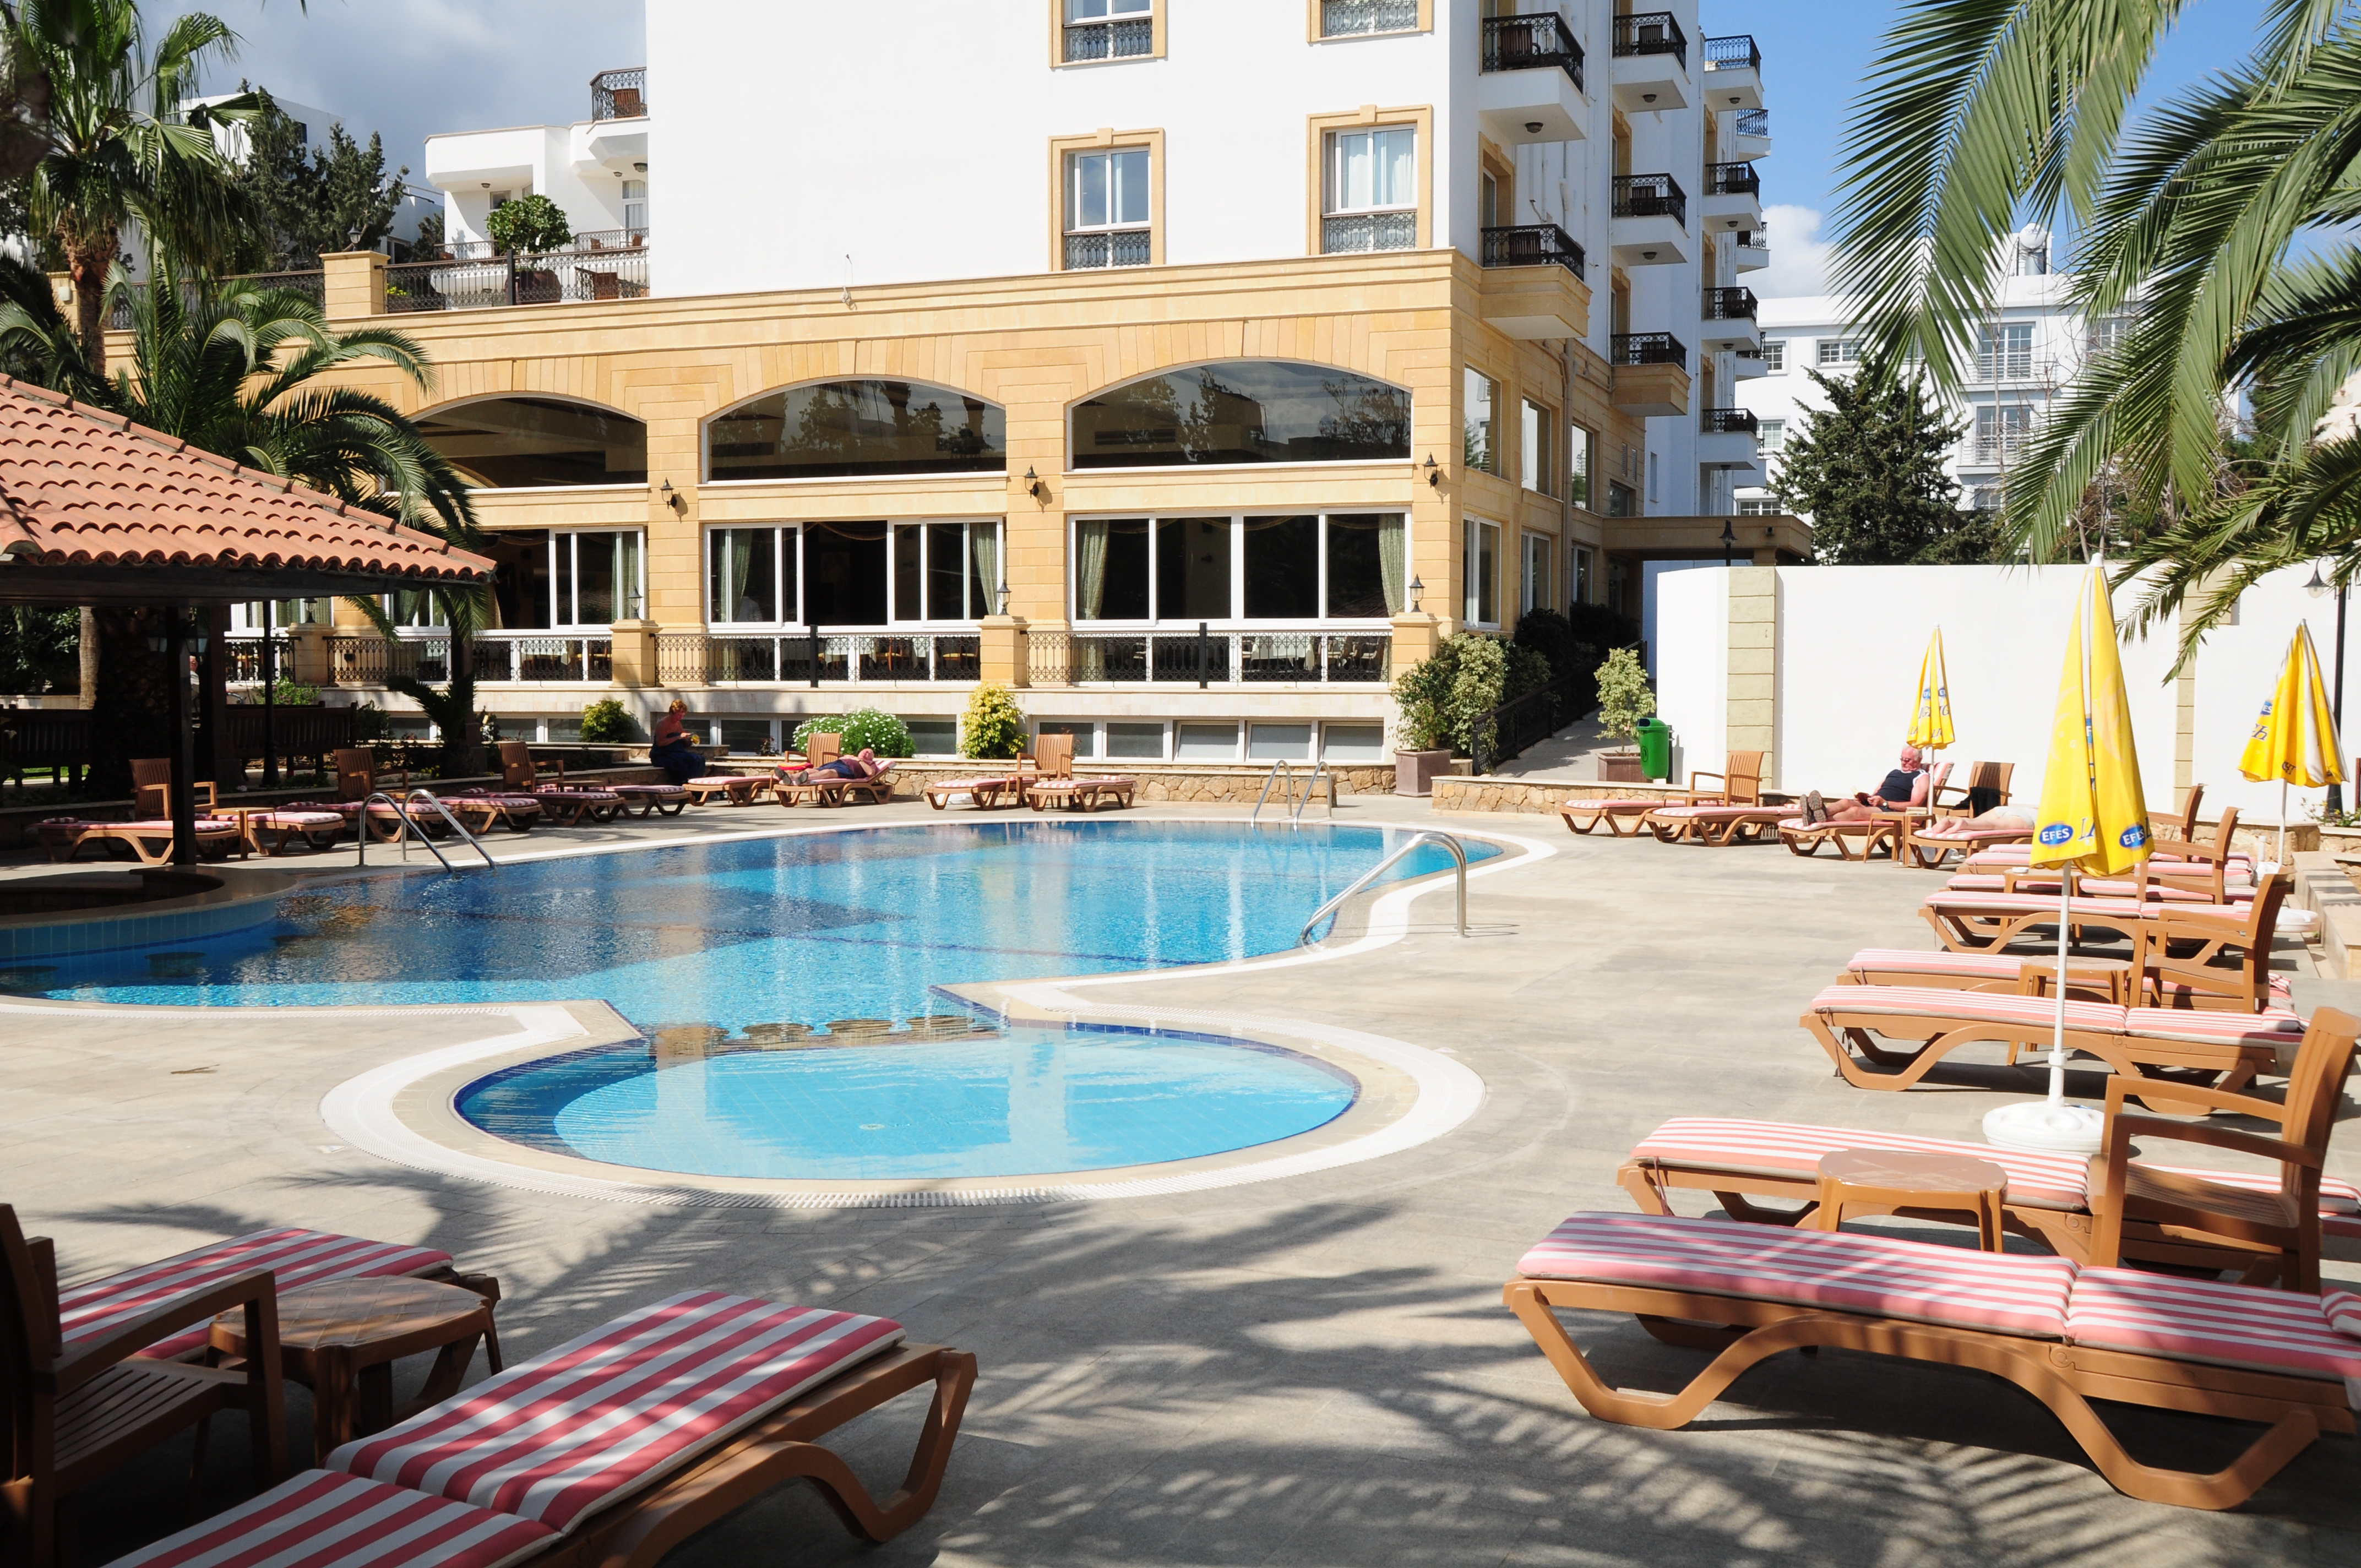 CYPR - ZIMA 2018/2019: Pia Bella Hotel****, 8 dni (25.01-01.02.2019 r.), dwa posiłki: 1689,00 PLN/osoba